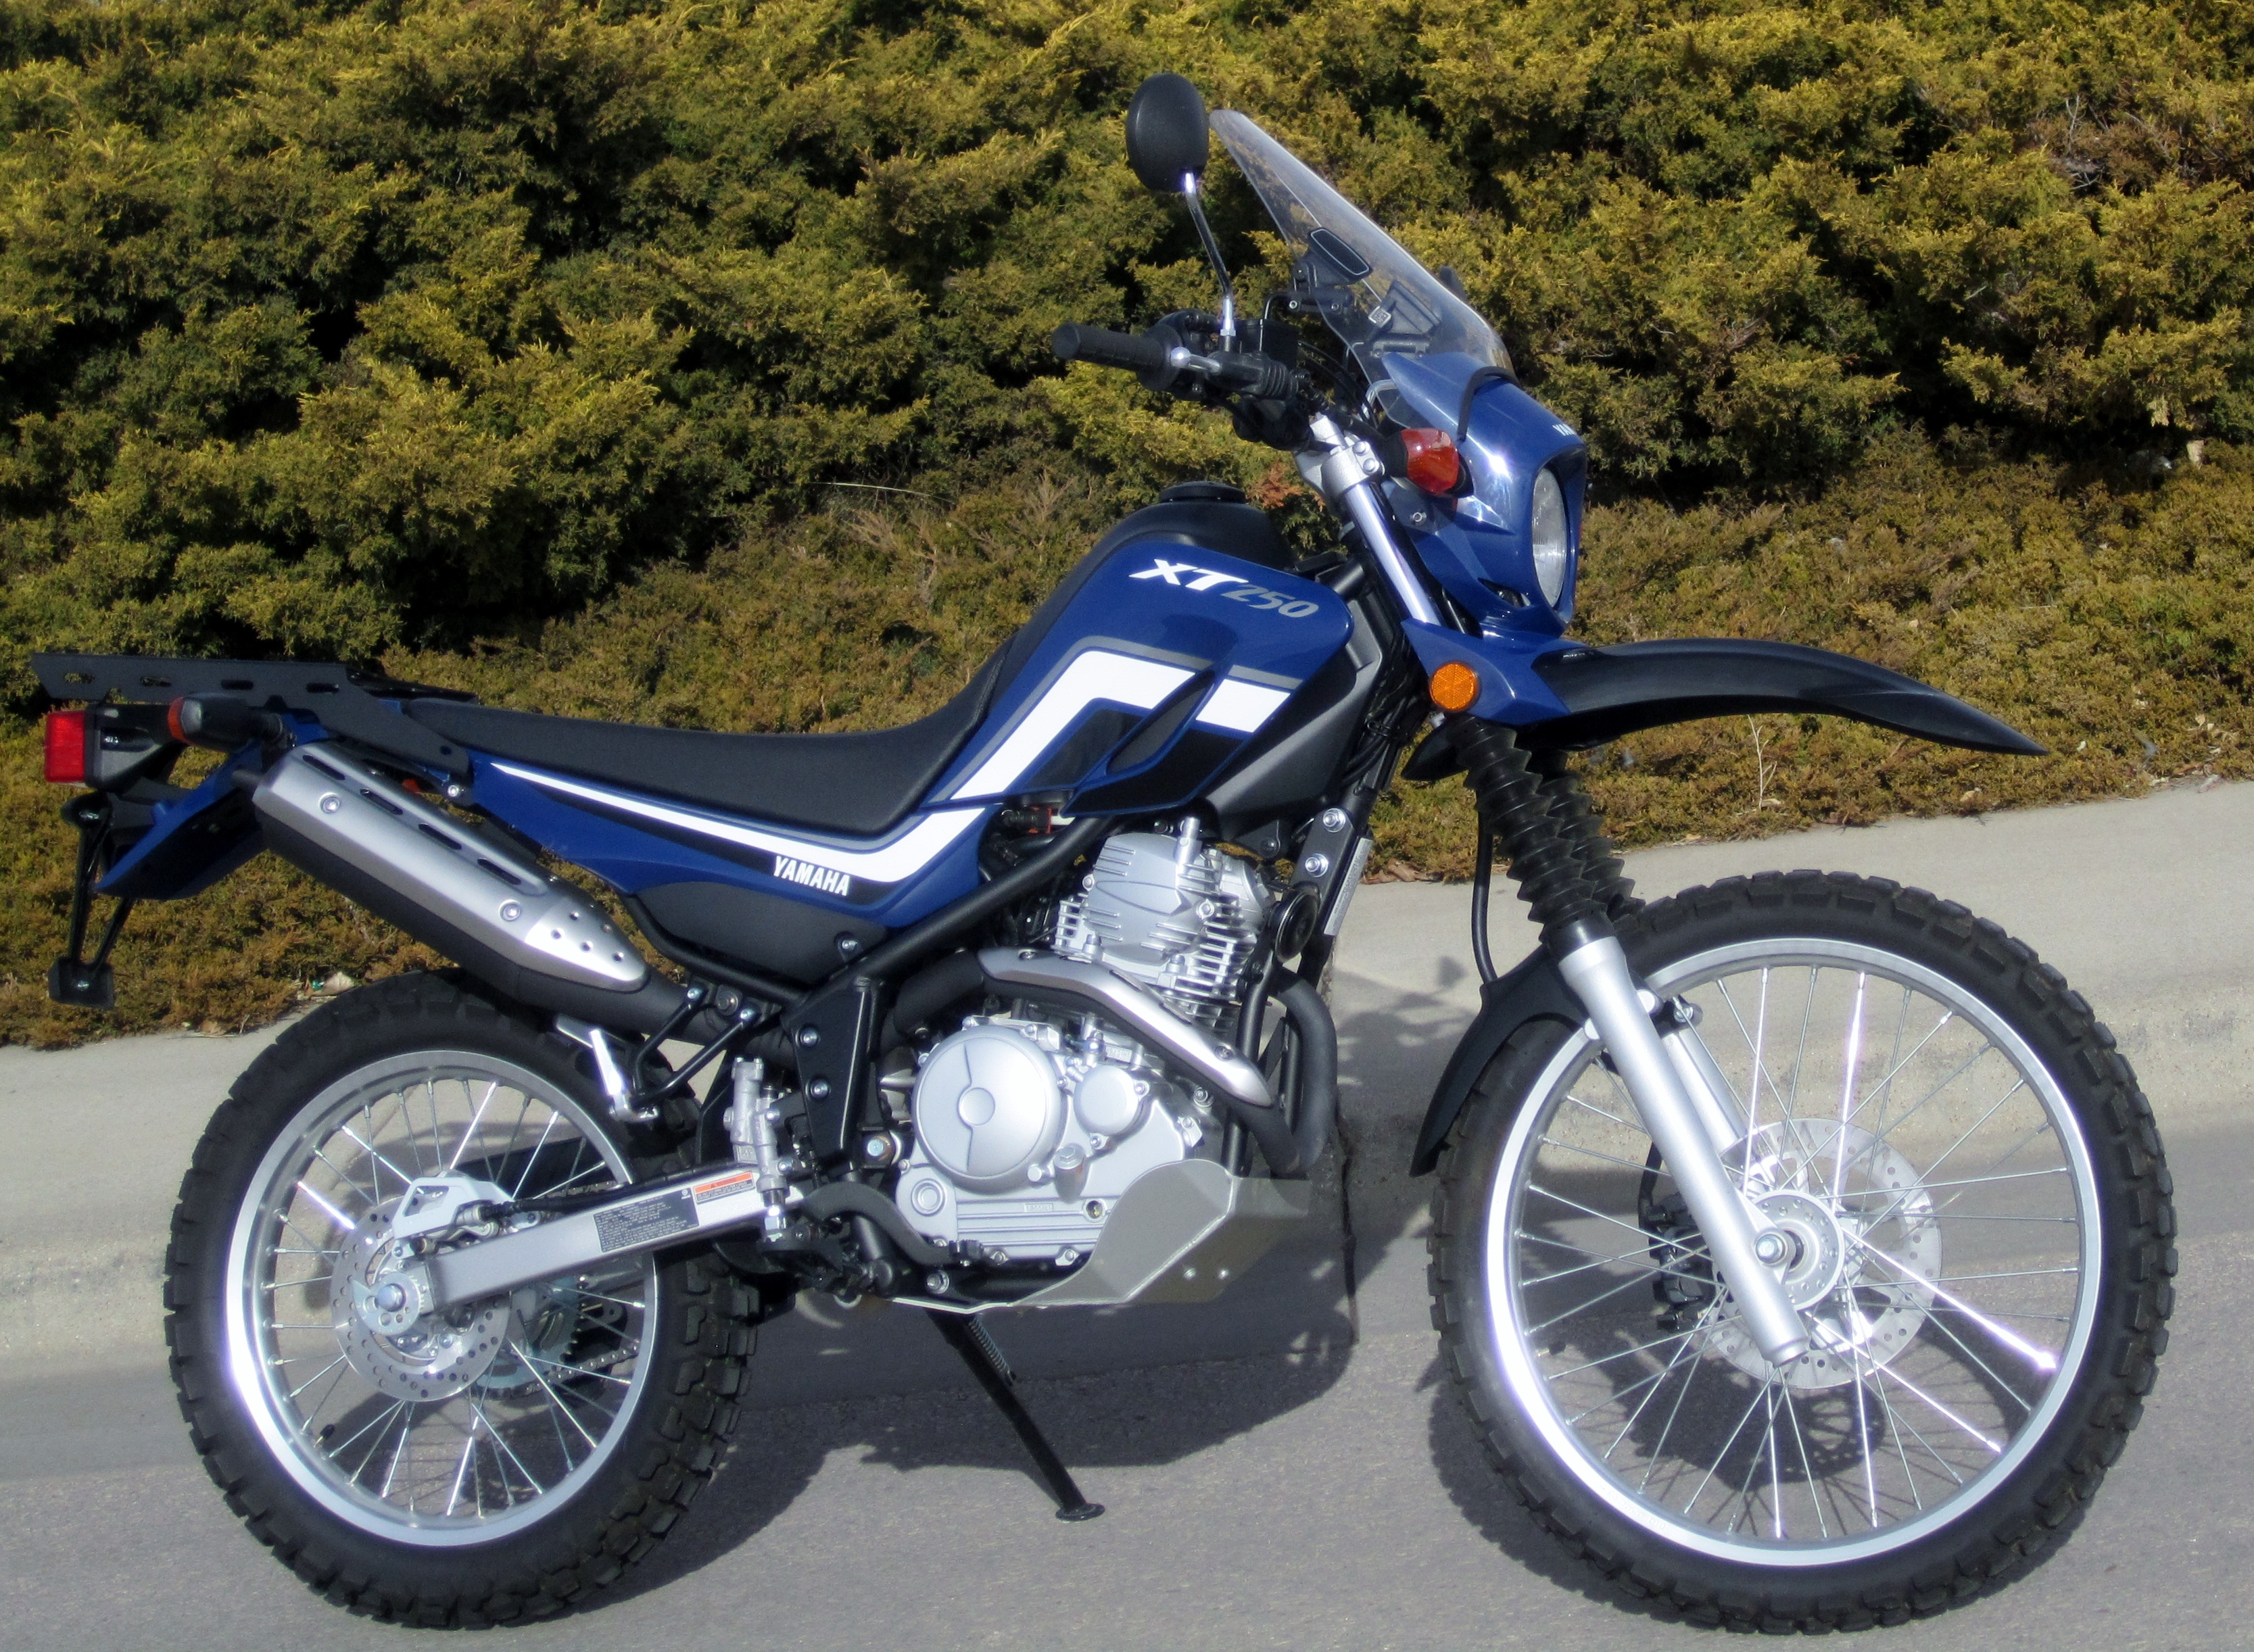 2016 Yamaha Xt250 Sold